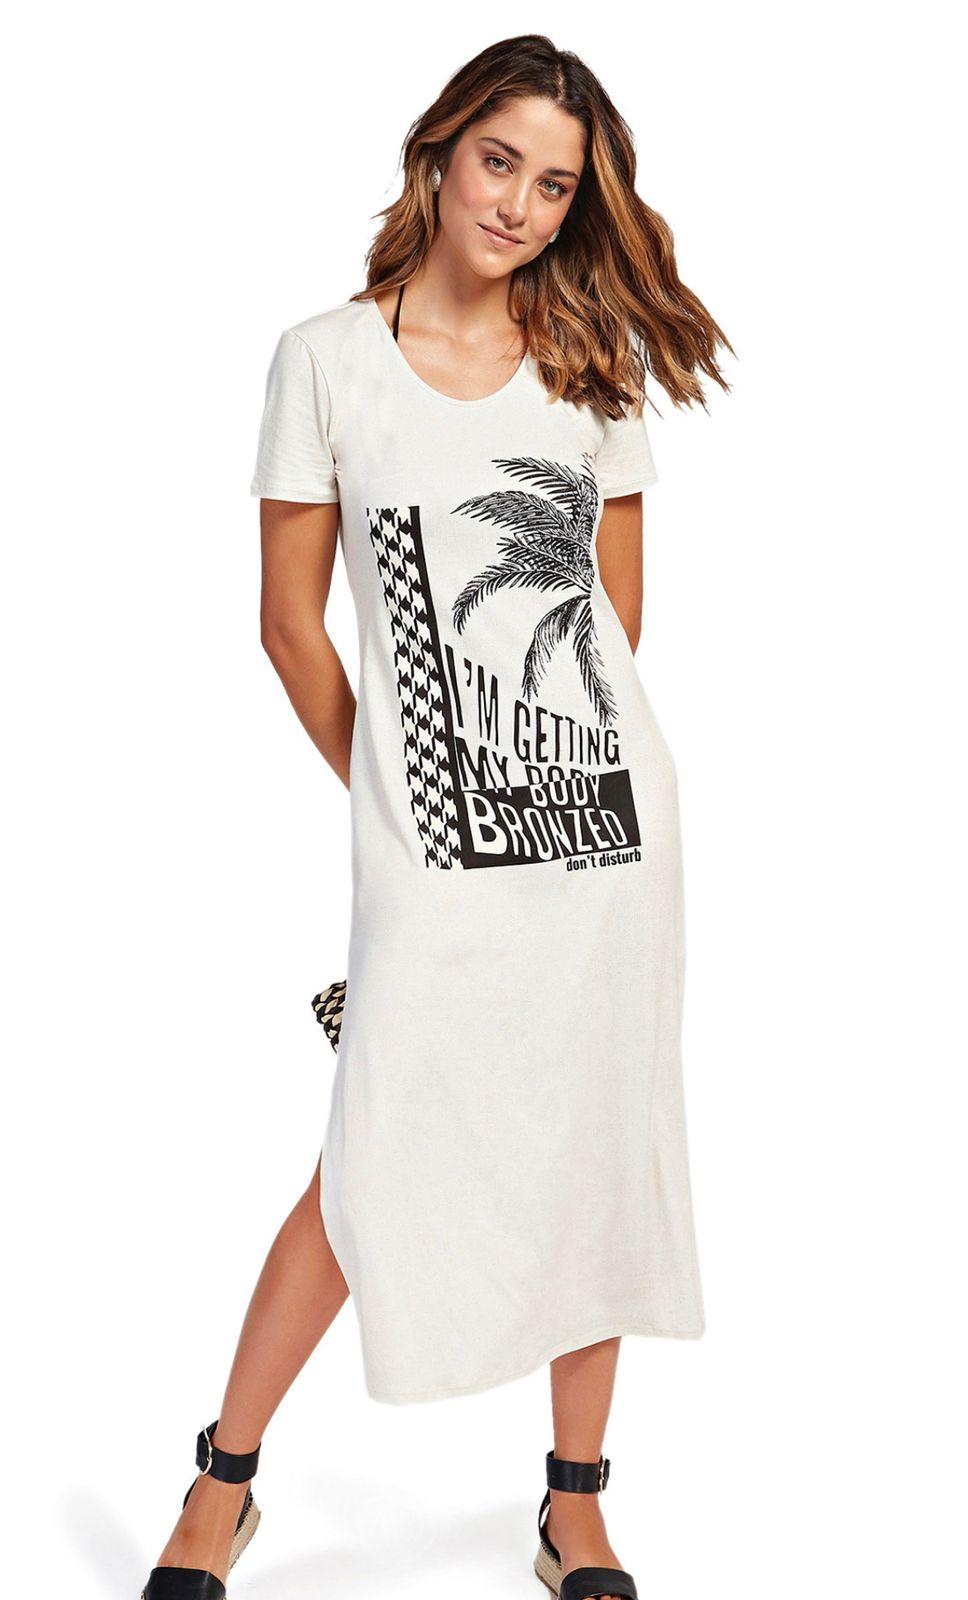 T-shirt Dress Morena Rosa Beach